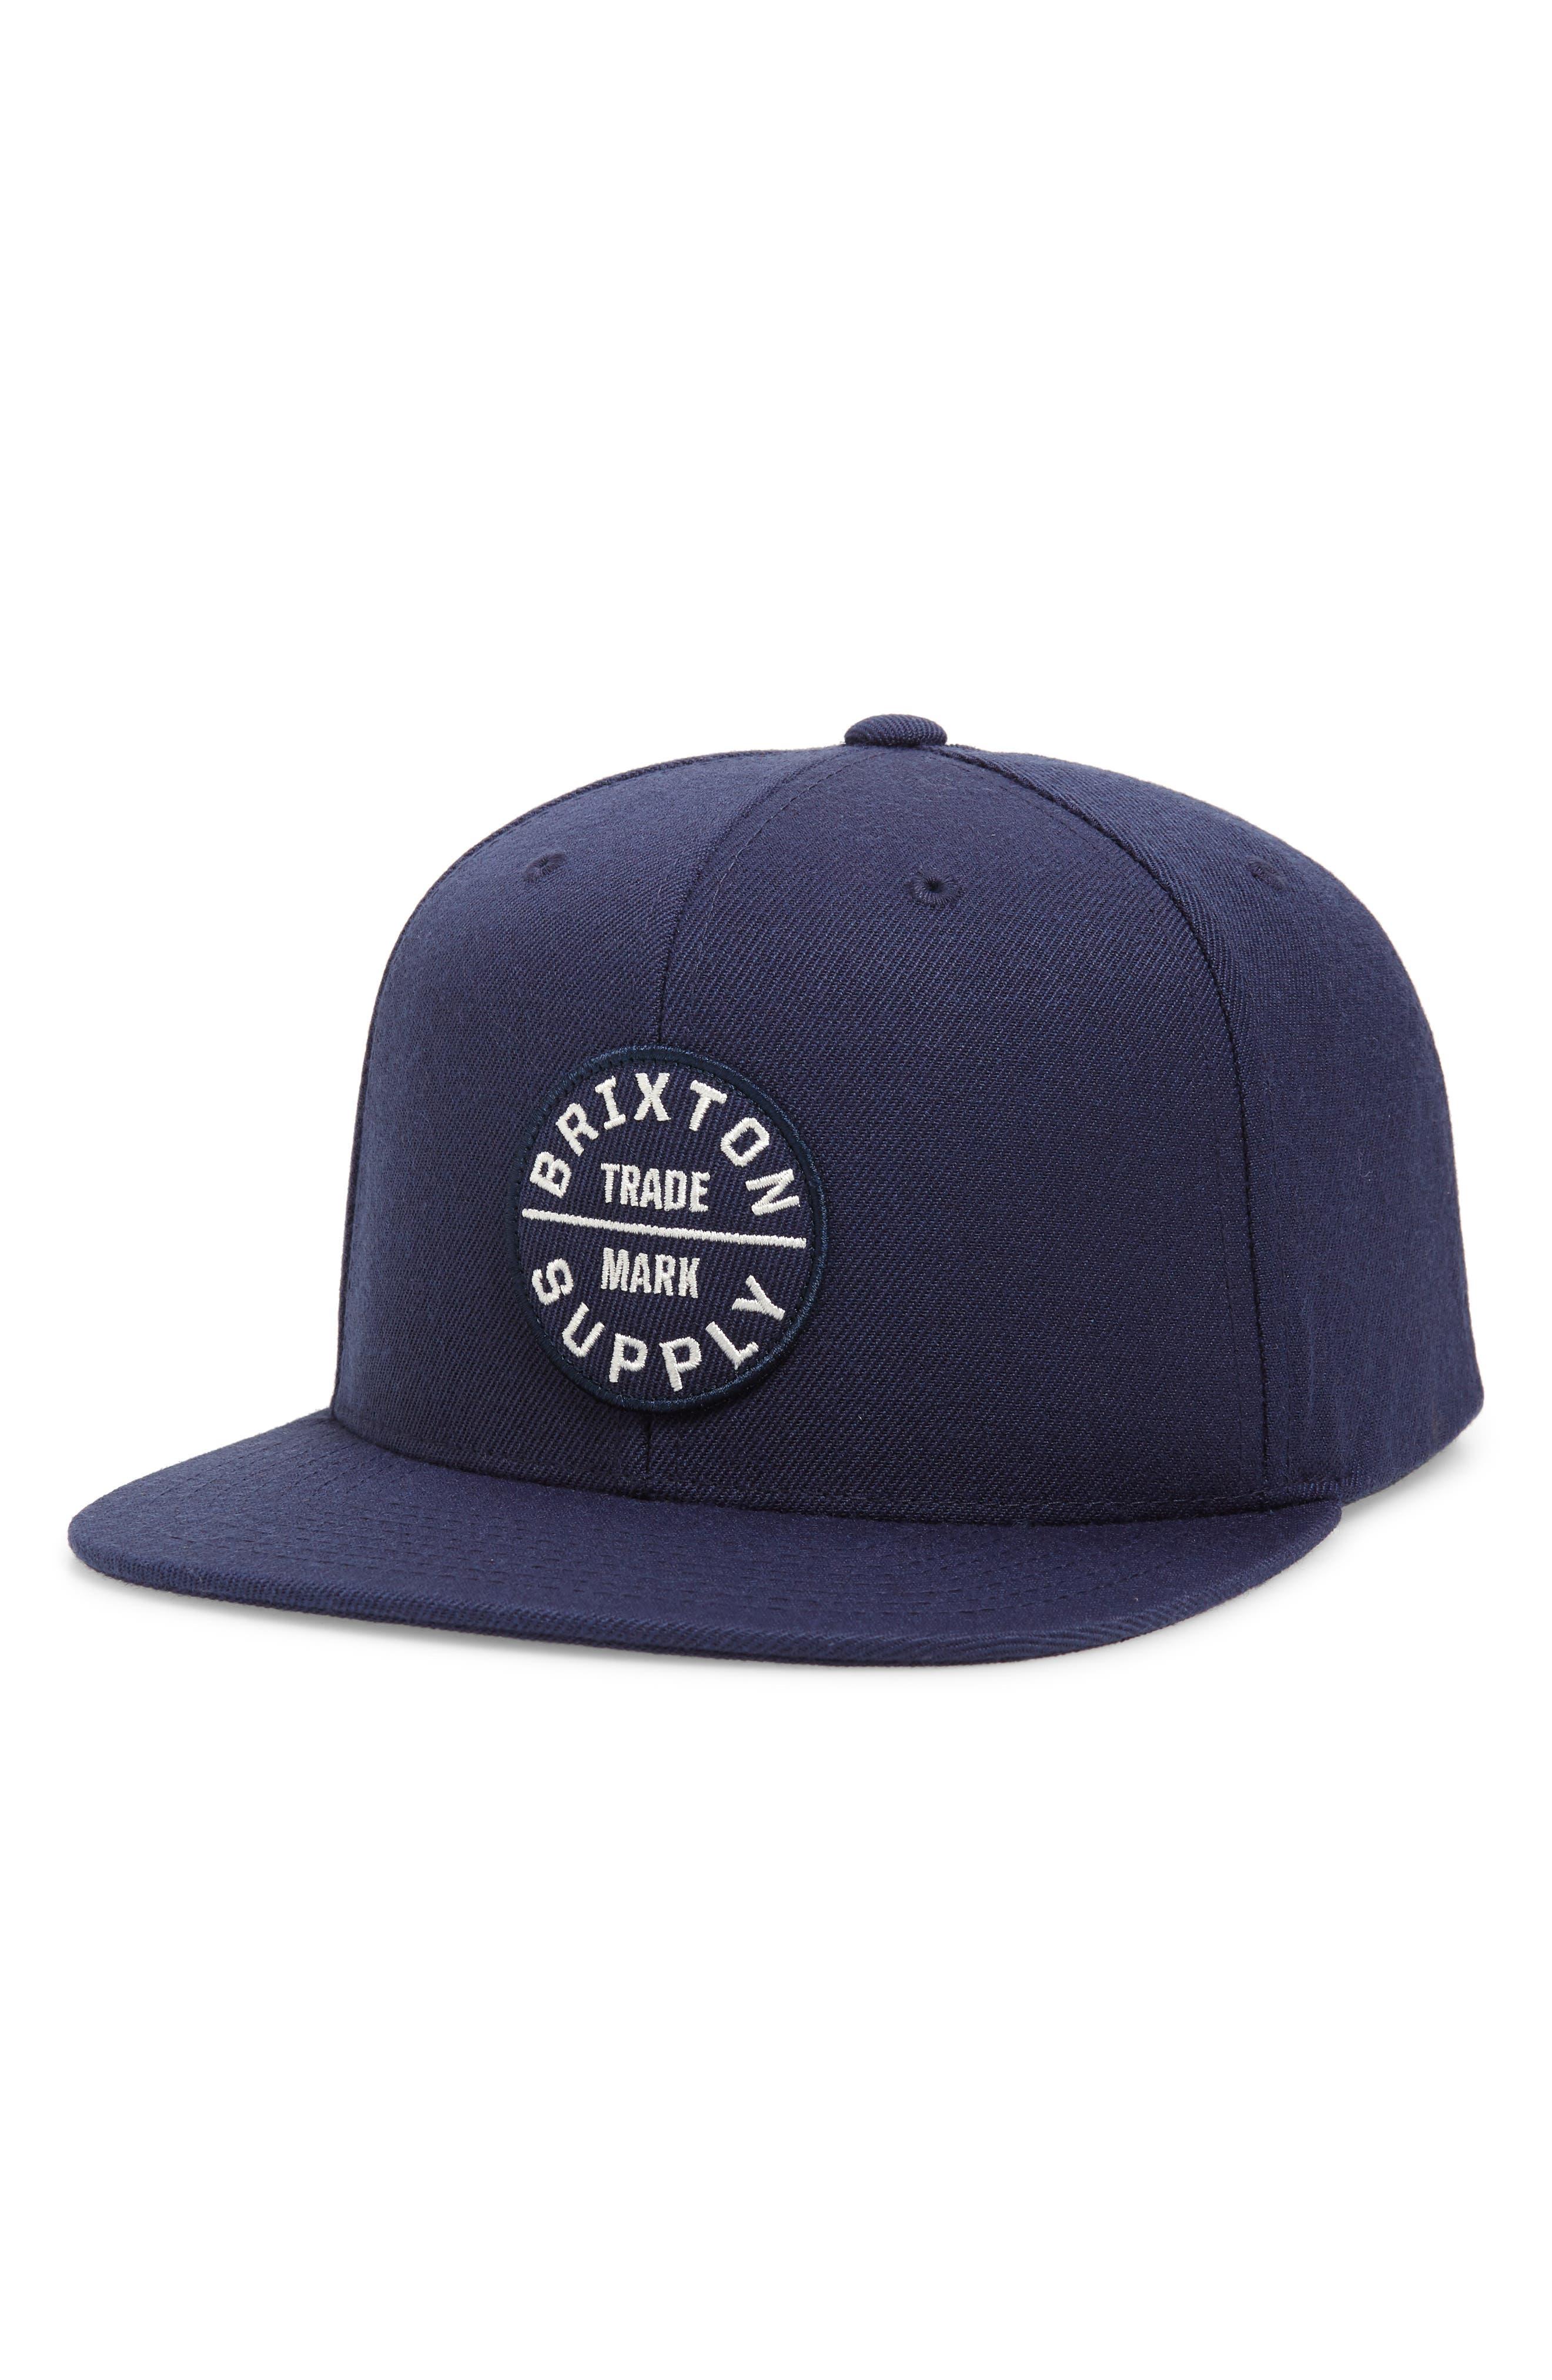 BRIXTON Unisex/_Adult Oath Iii Baseball Cap